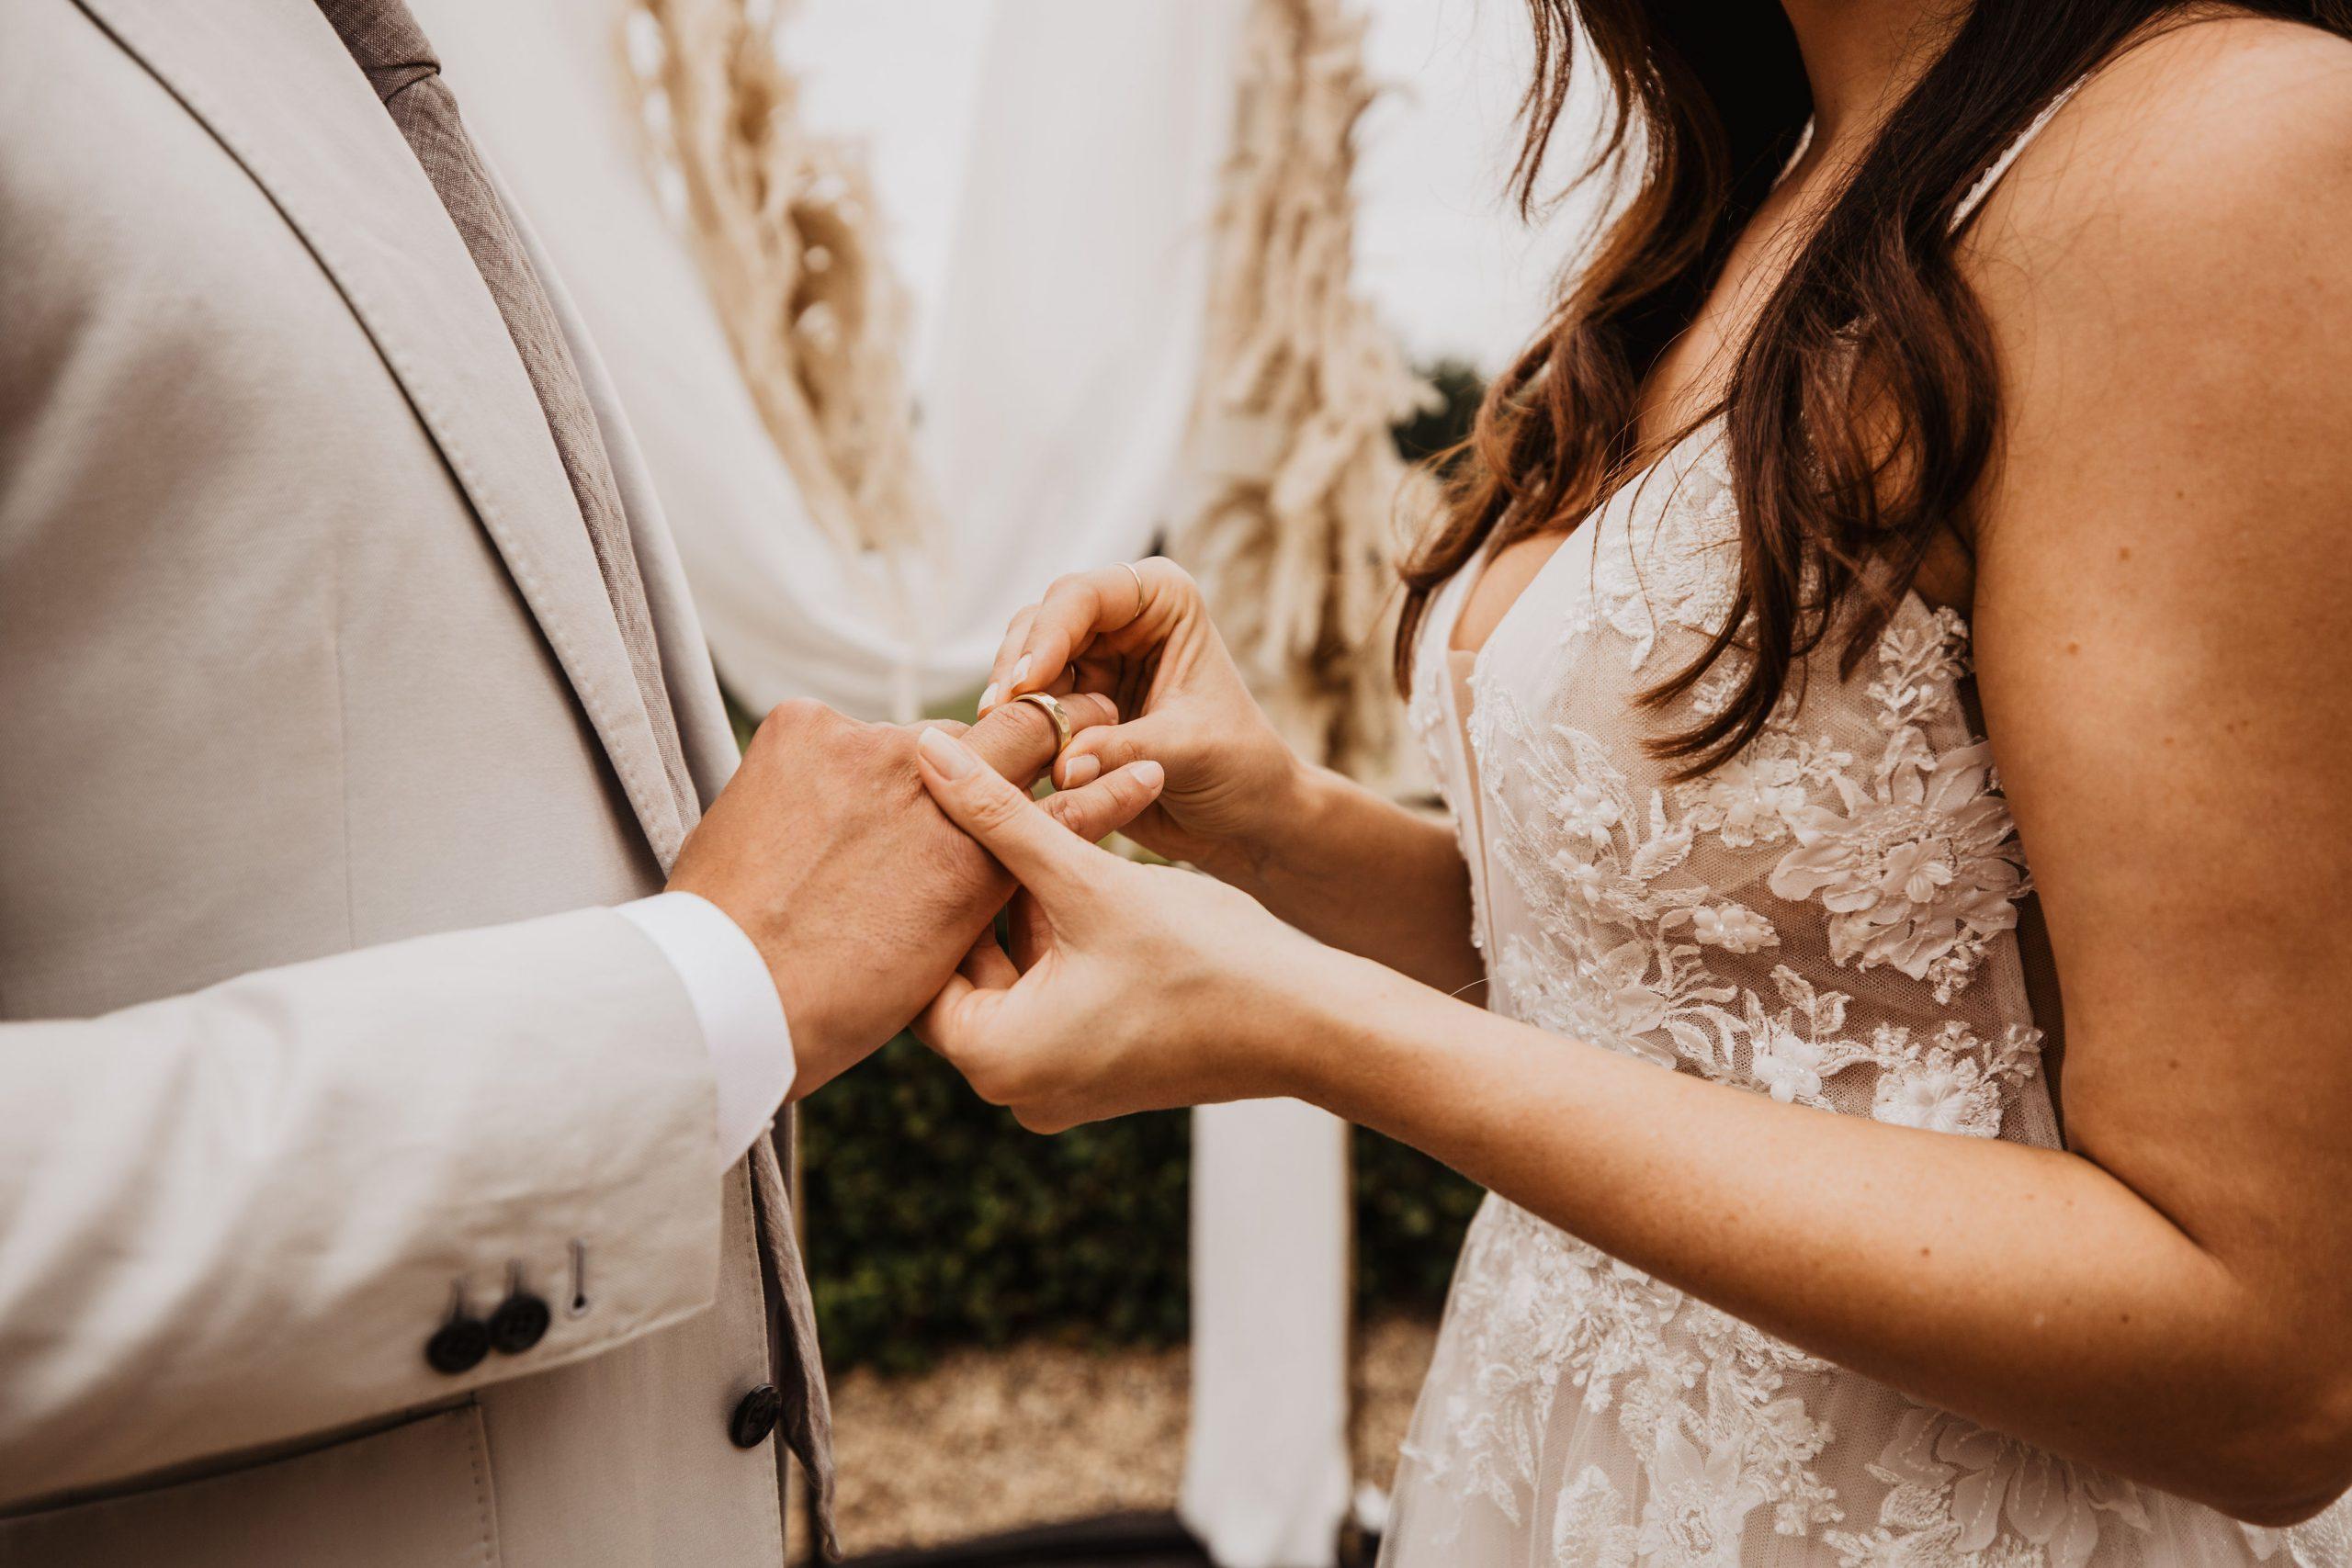 Putting on his wedding ring